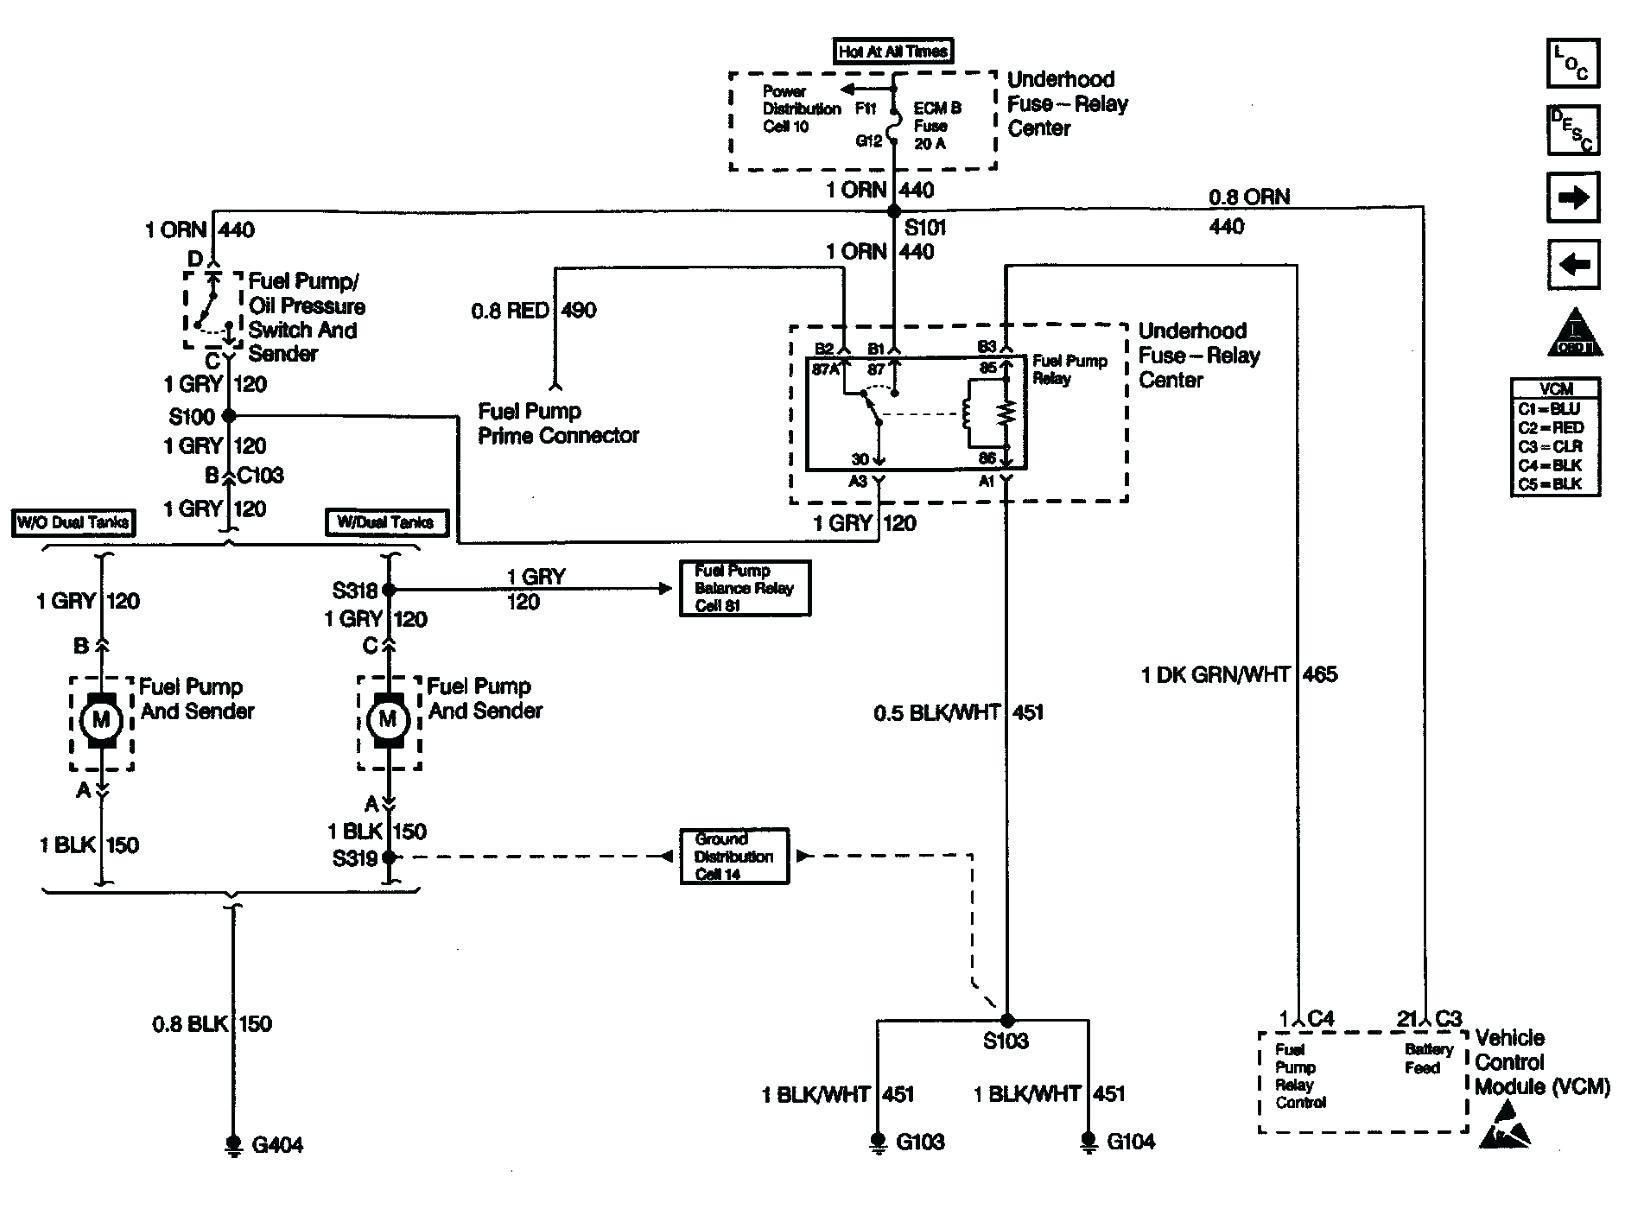 TW_7150] Dodge Ram 1500 Wiring Diagram Also Dodge Ram 1500 Wiring Diagram  On Download DiagramLave Synk Cette Mohammedshrine Librar Wiring 101